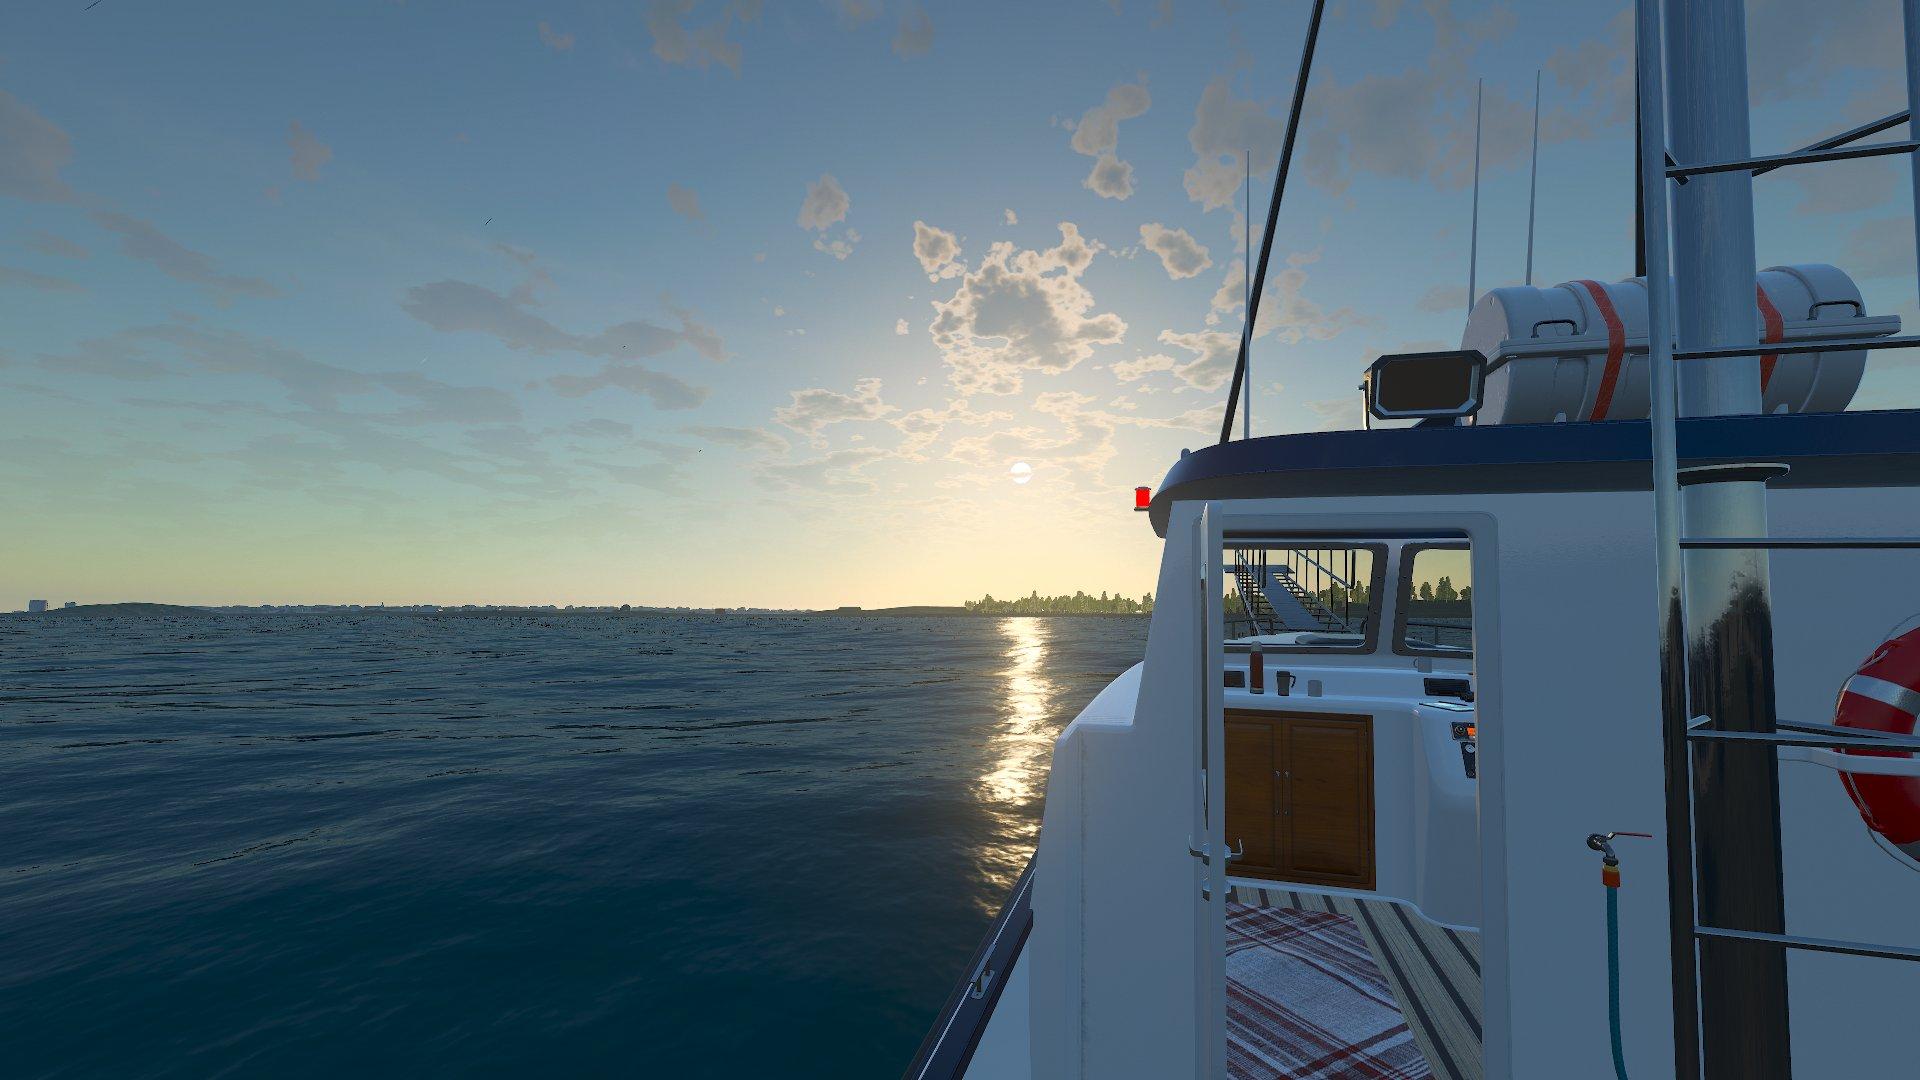 Fishing: North Atlantic Review - What I Like